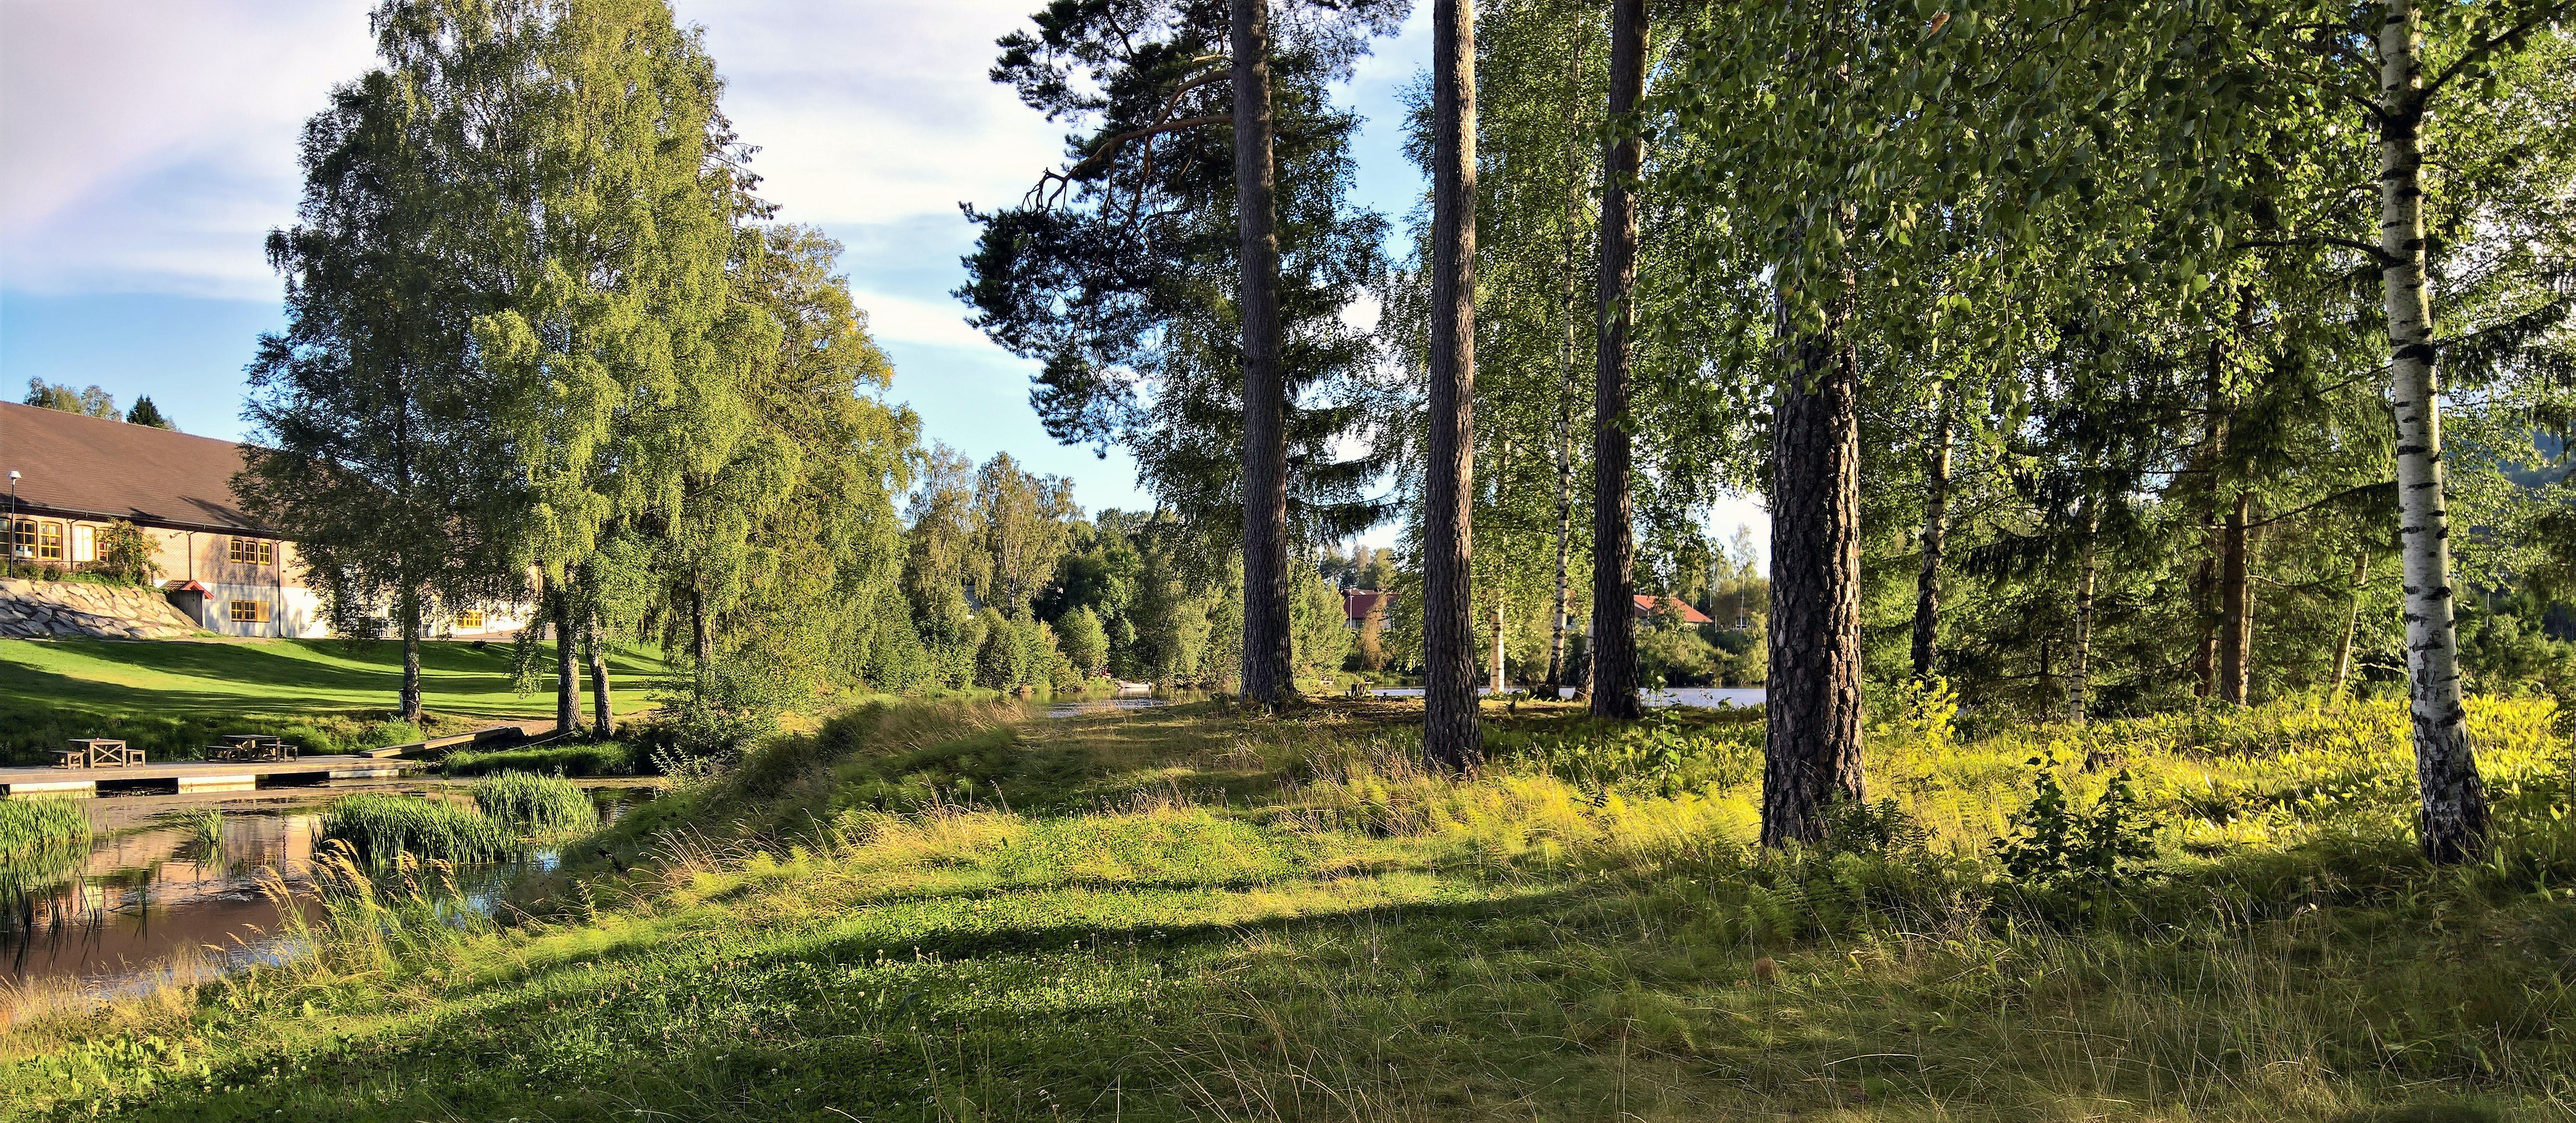 Landscape Photograph of Tree Line